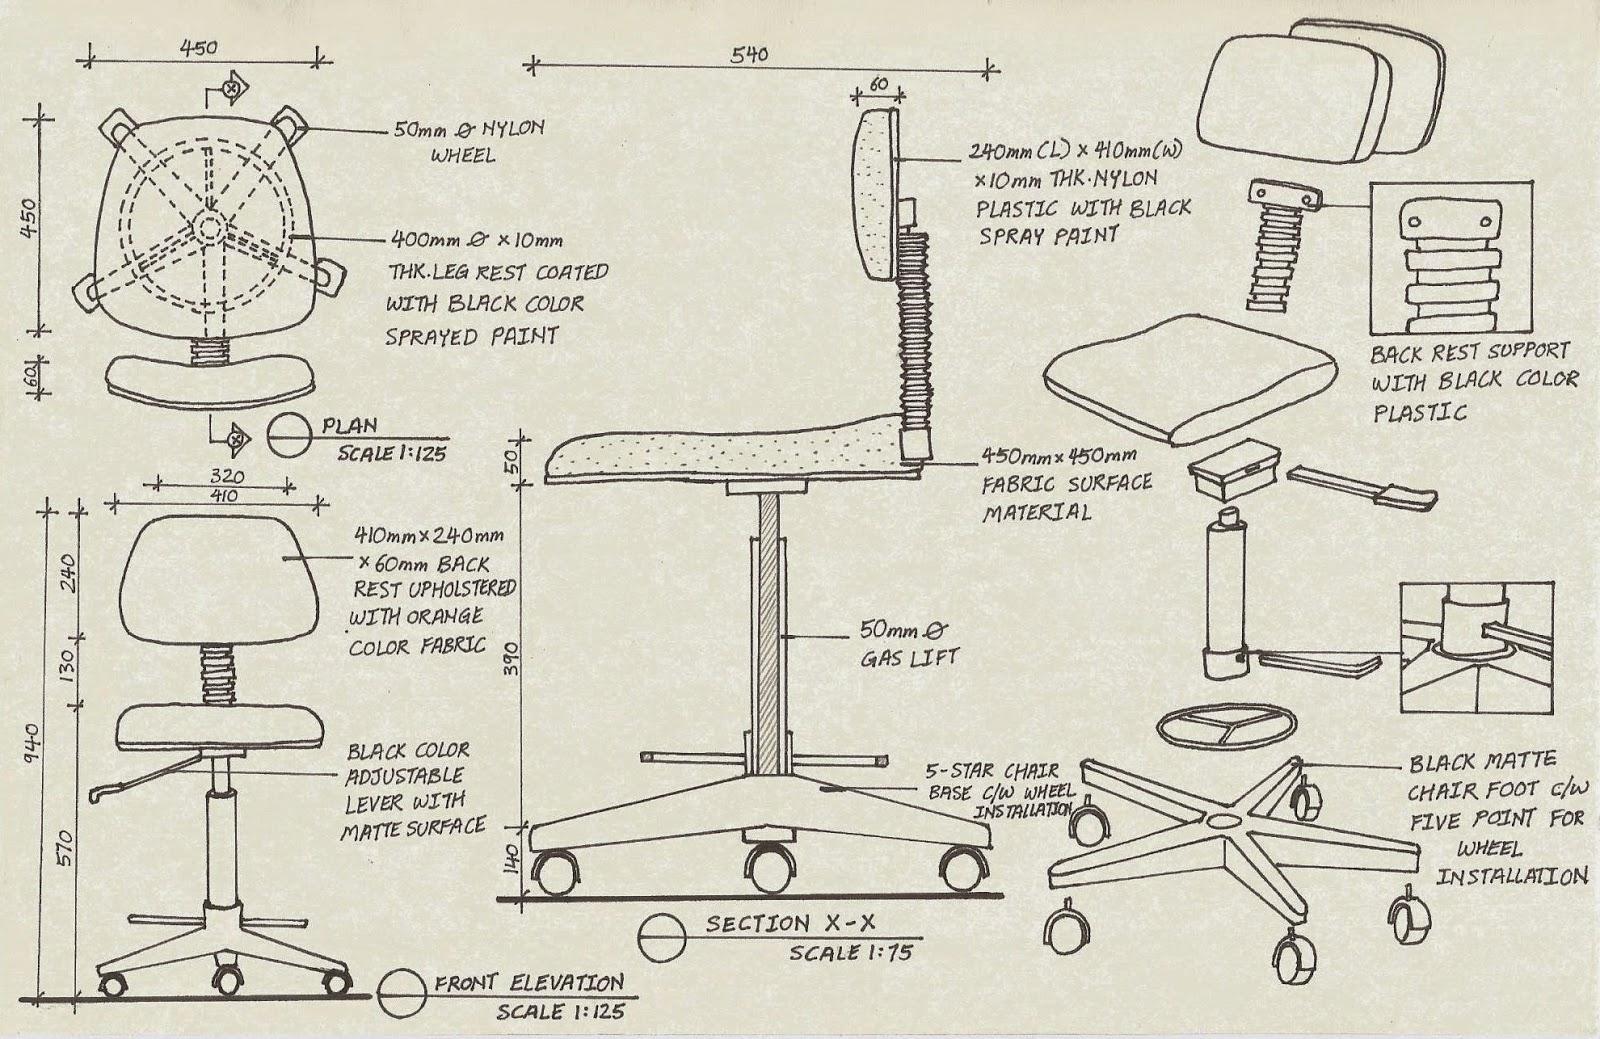 1600x1039 Yii Min In.design Furniture Detail Drawing